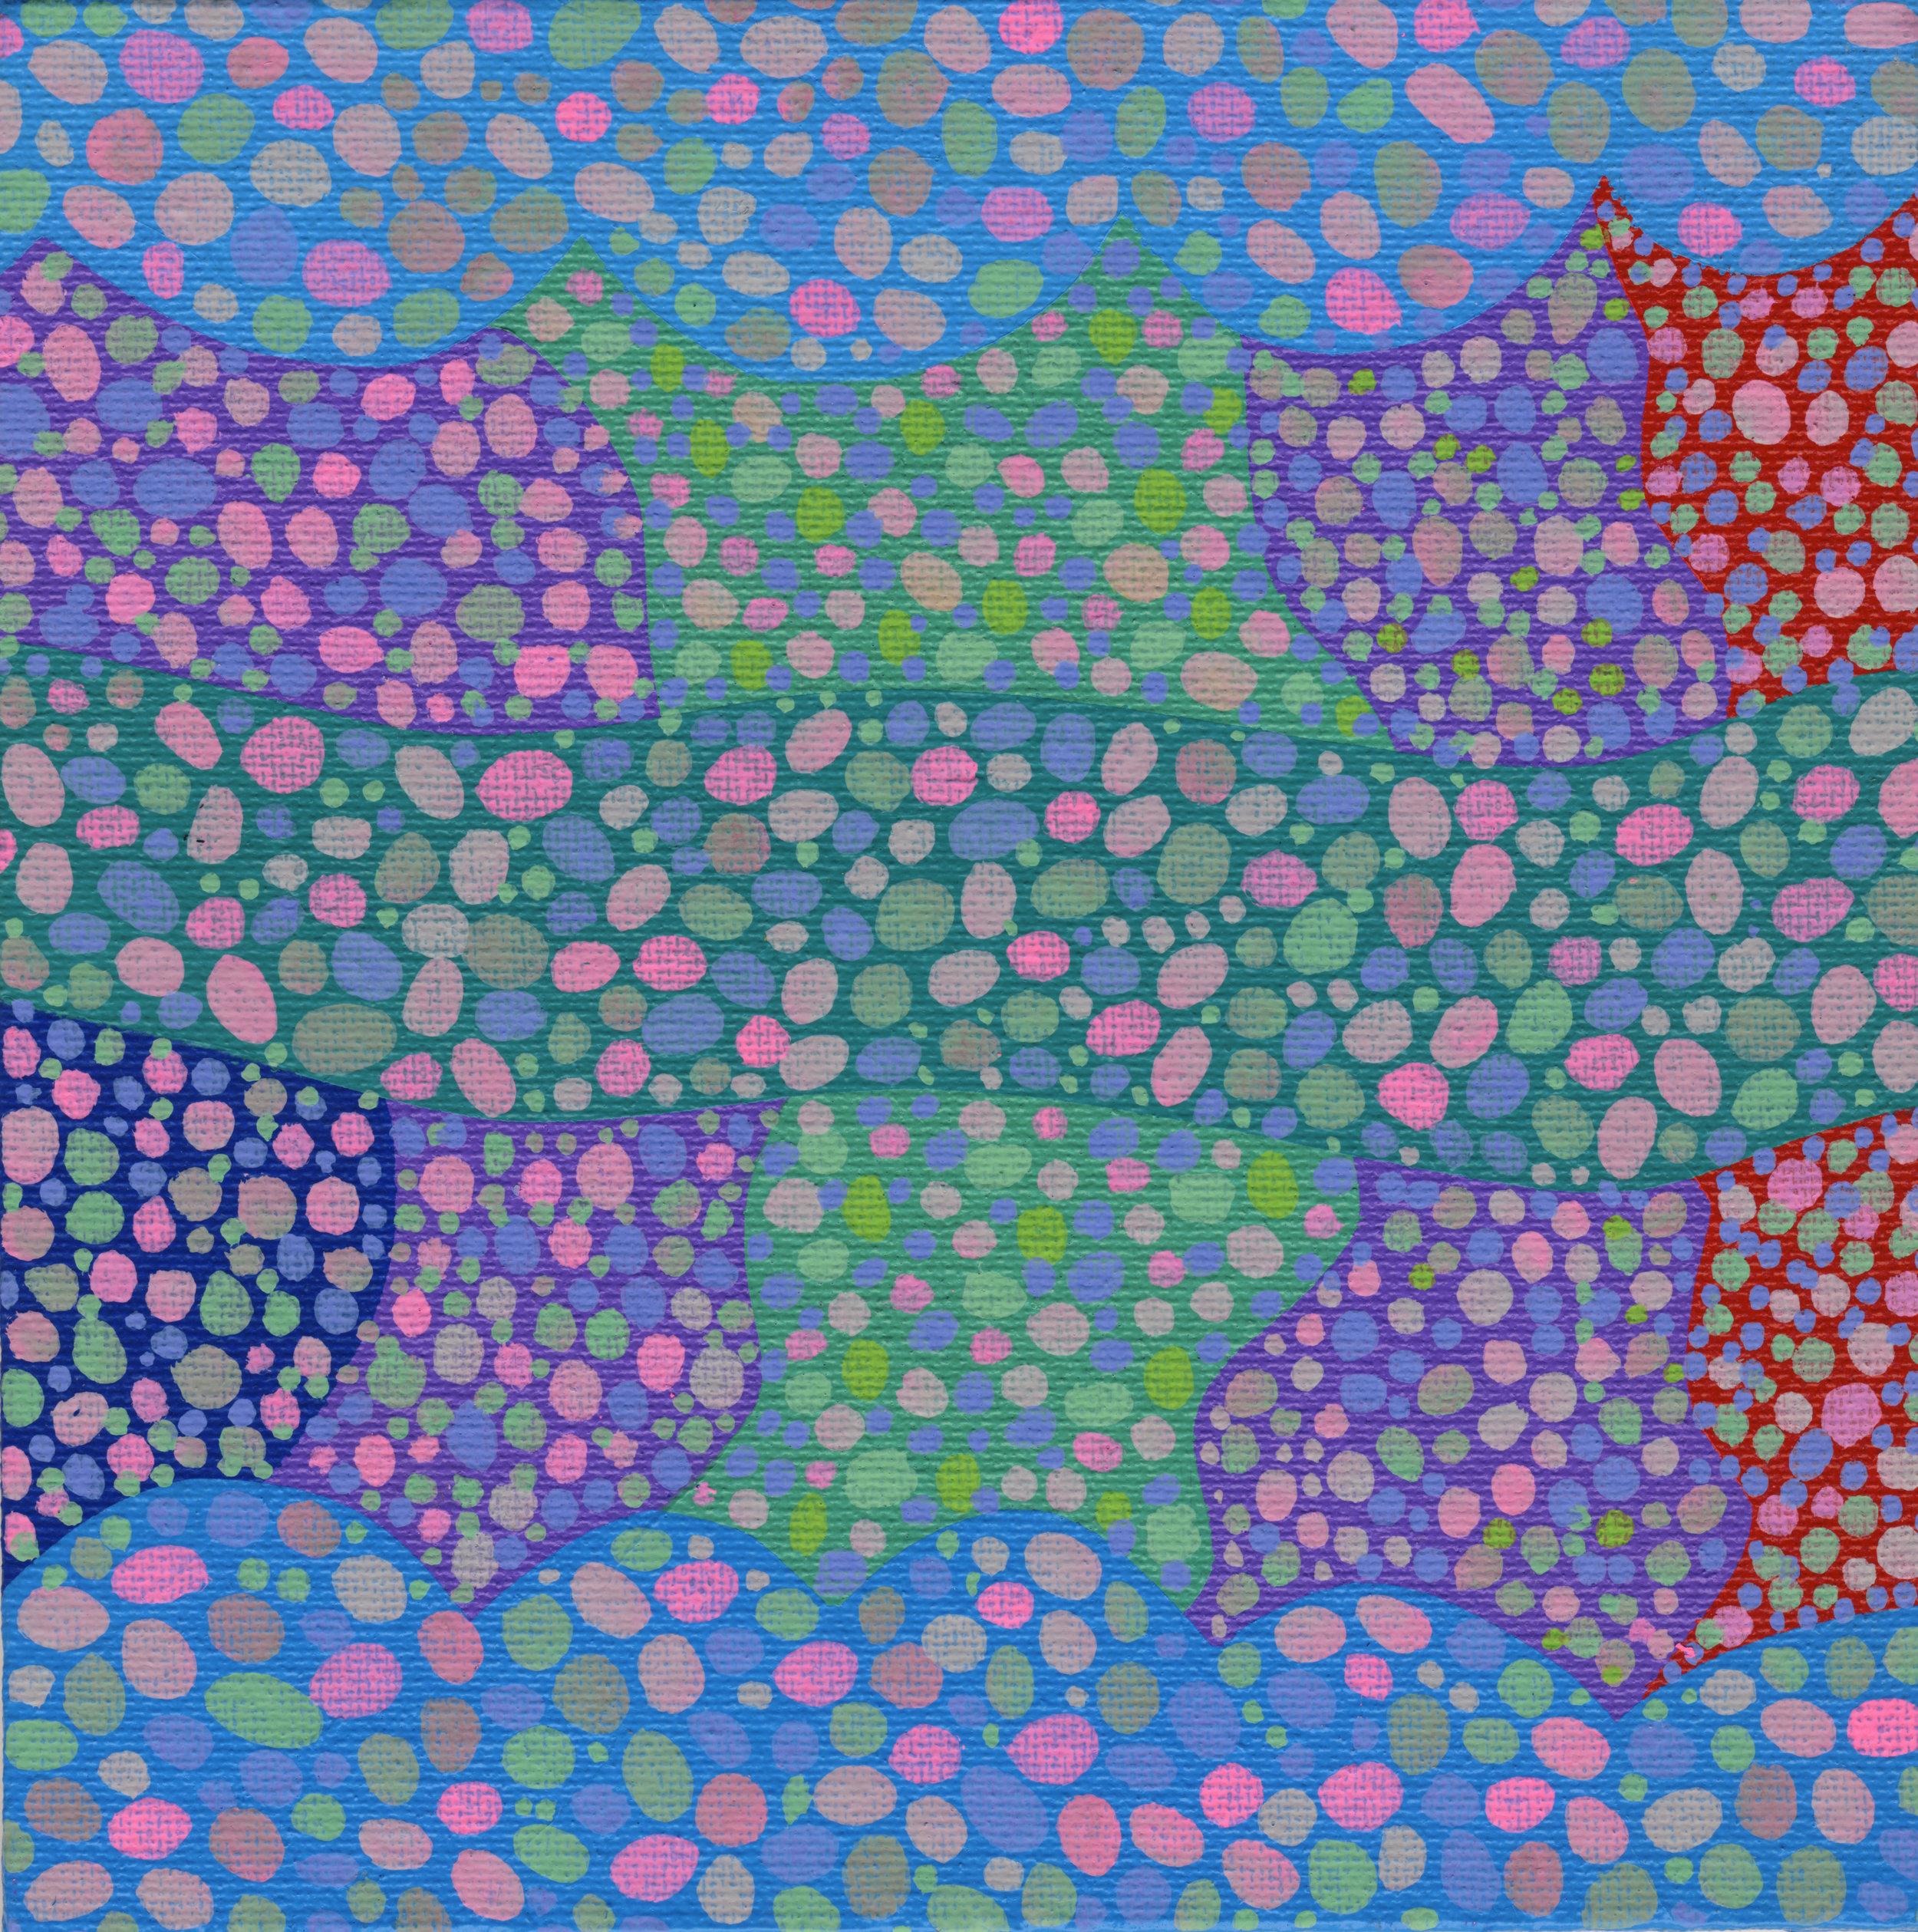 "100/100, Acrylic on canvas panel, 6"" X 6"", 4/16/19"